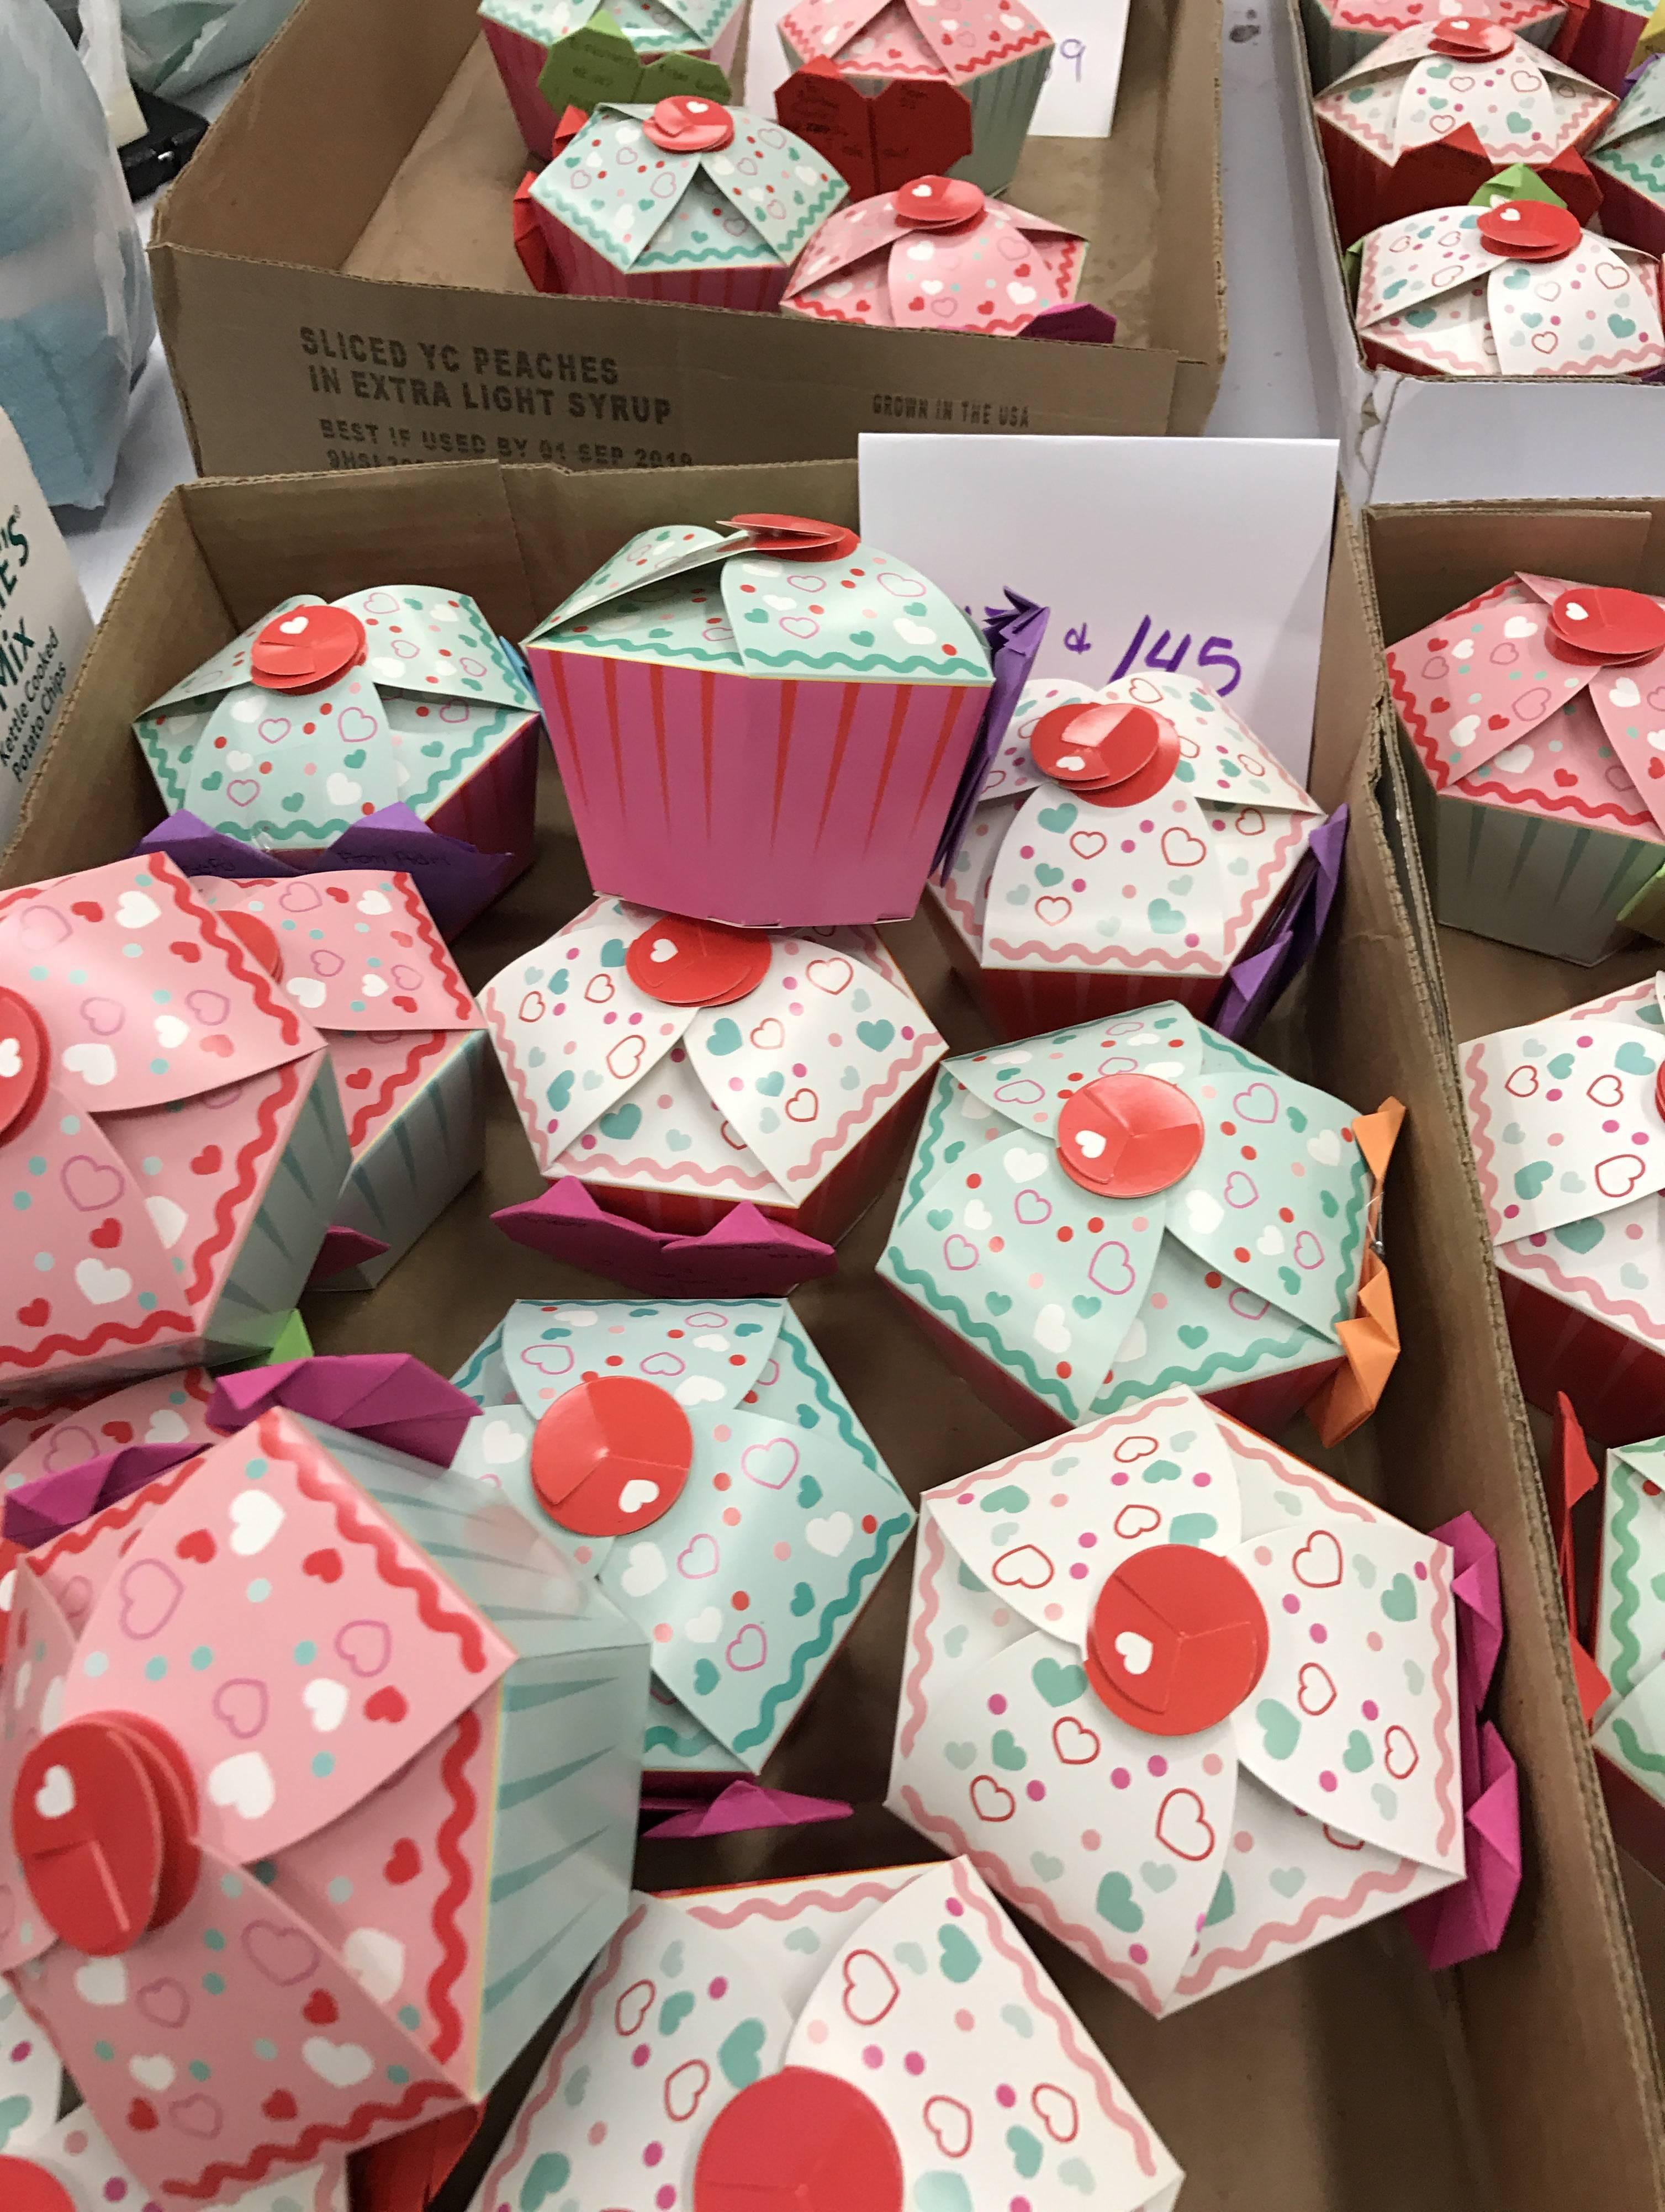 afe29ebd74a33ec163fc_cupcakes__2.jpg